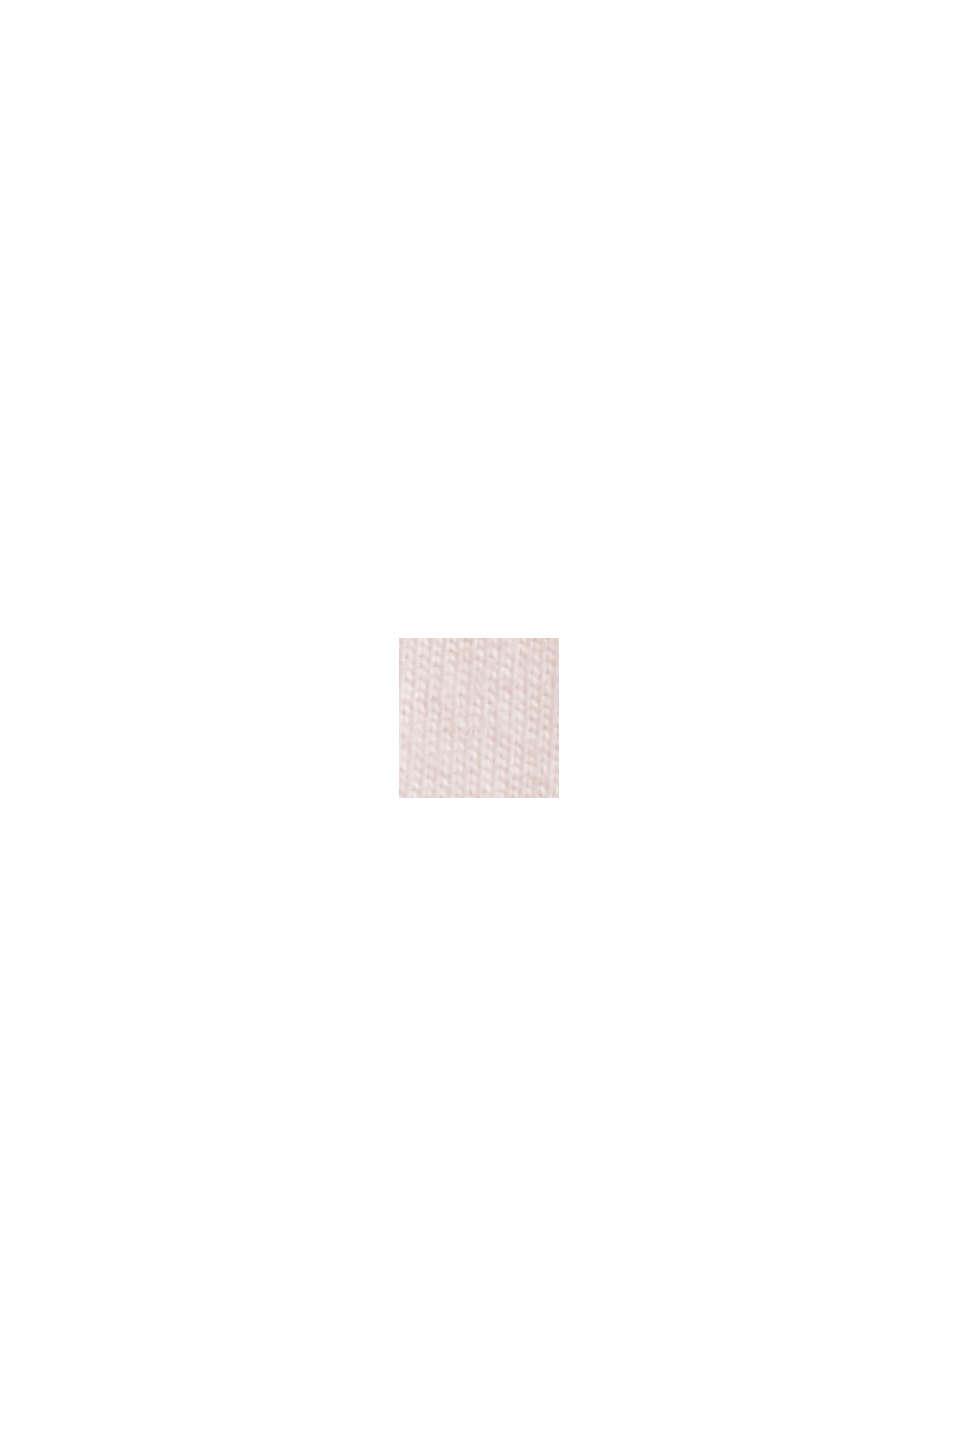 Jersey-Nachthemd aus 100% Organic Cotton, LIGHT PINK, swatch